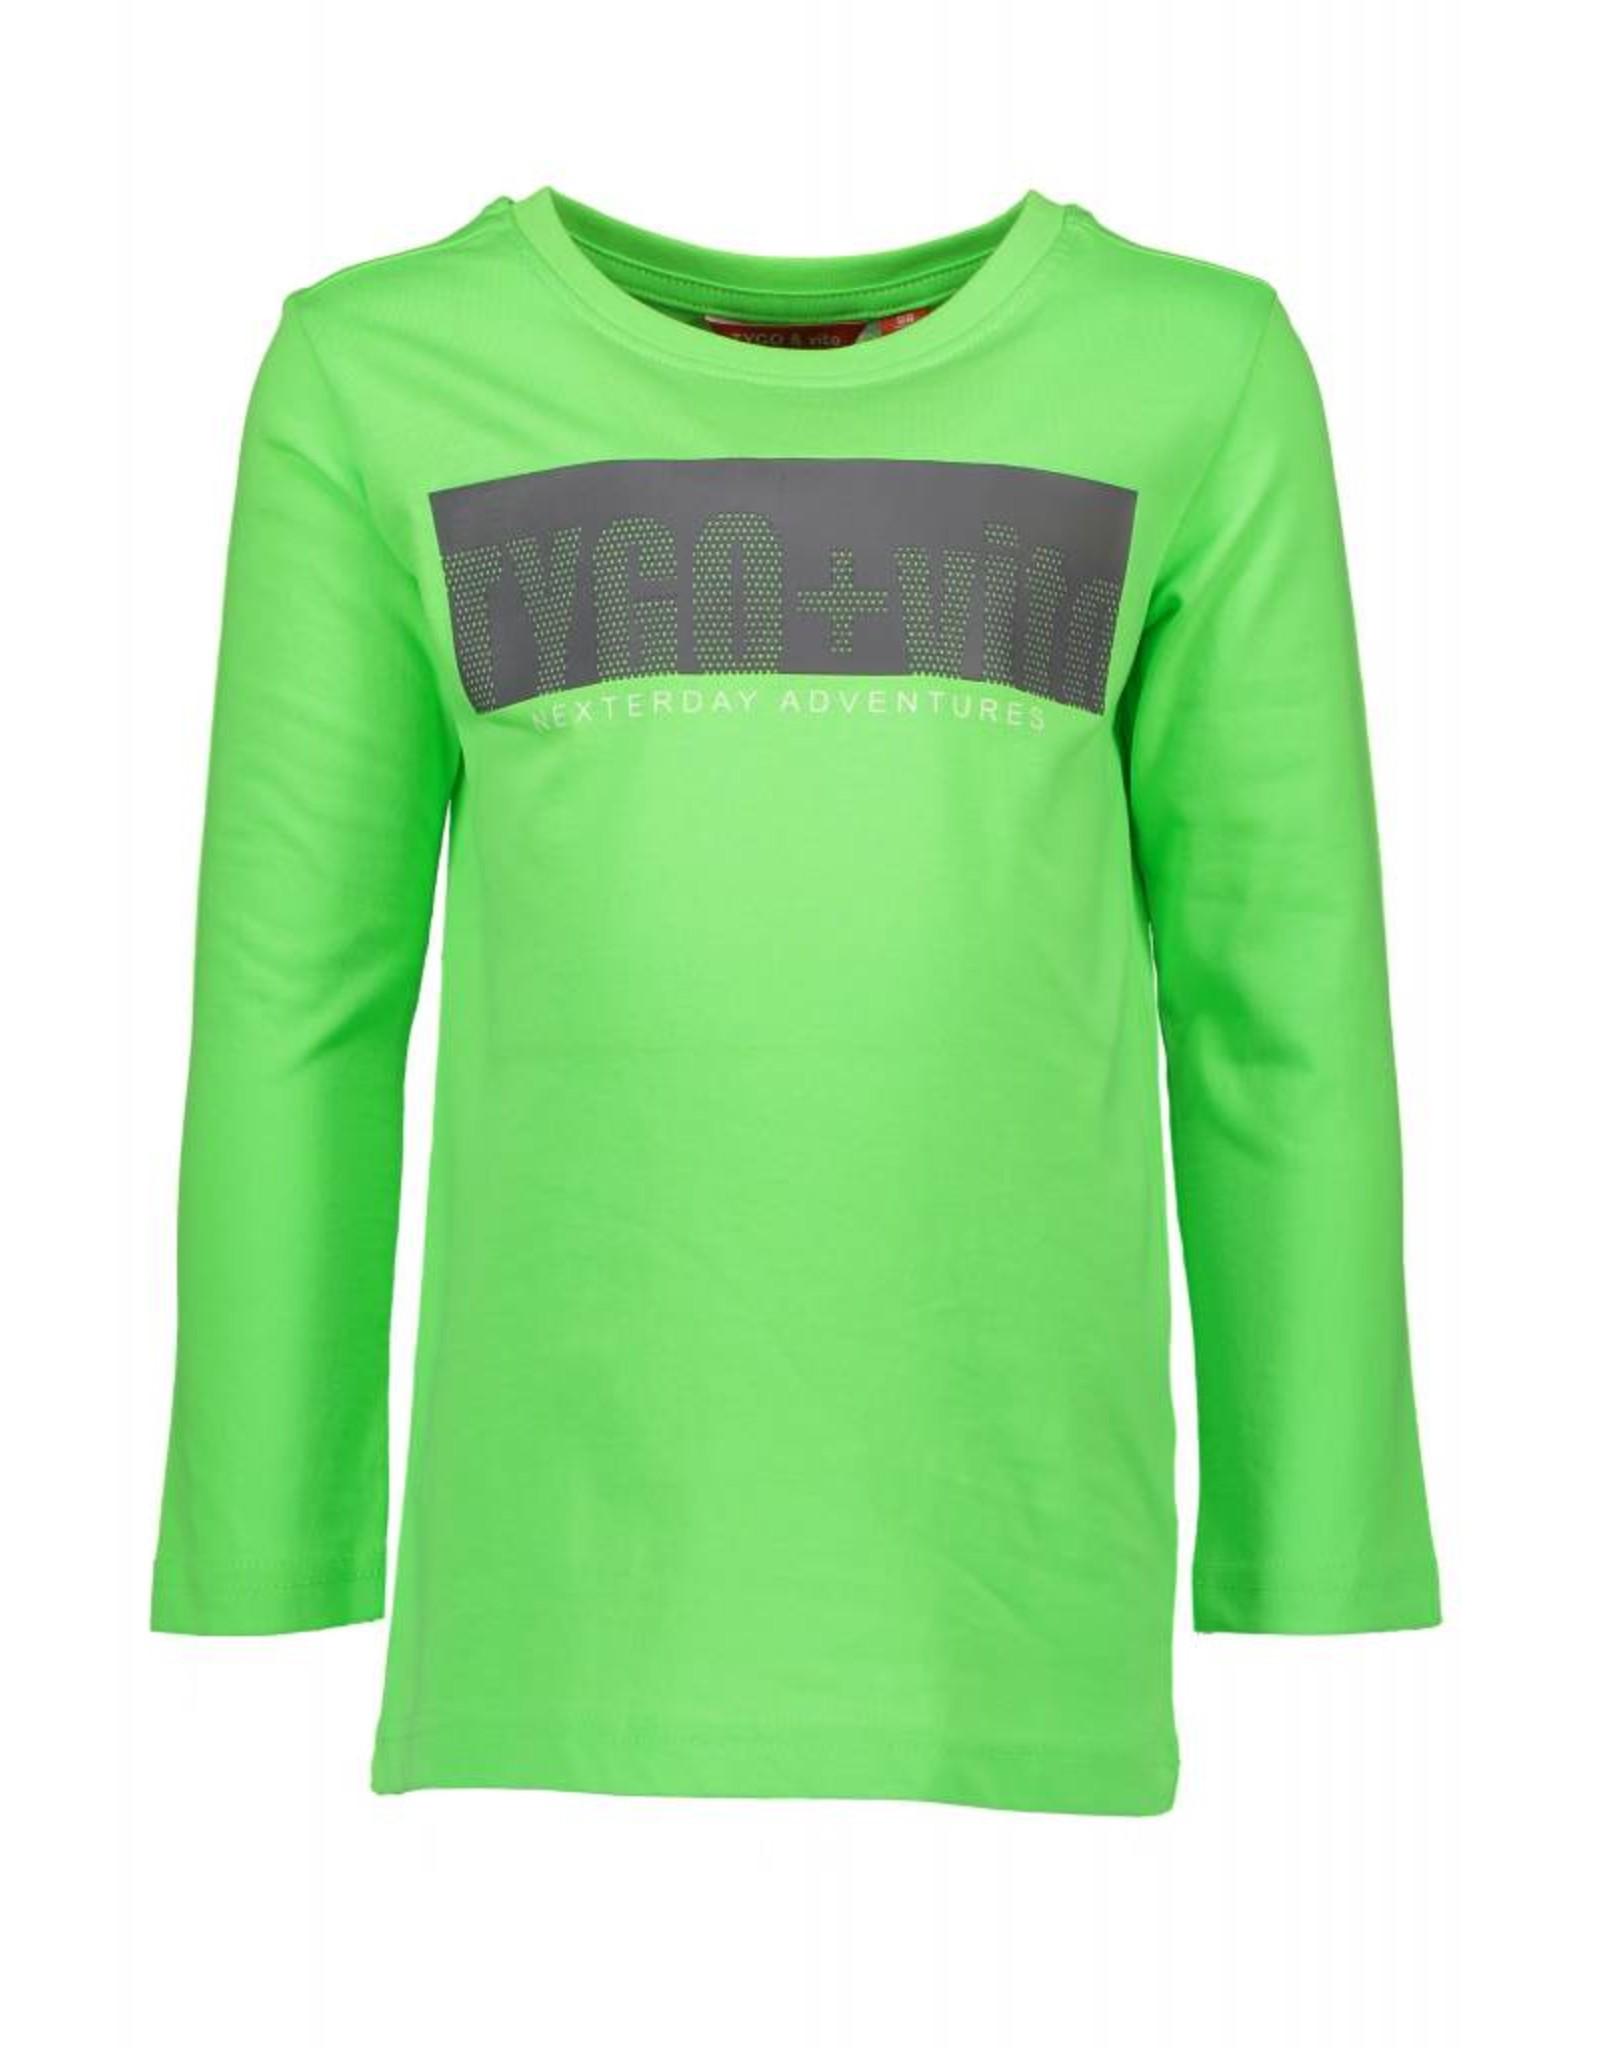 TYGO & vito TYGO & vito jongens shirt Nexterday Adventures